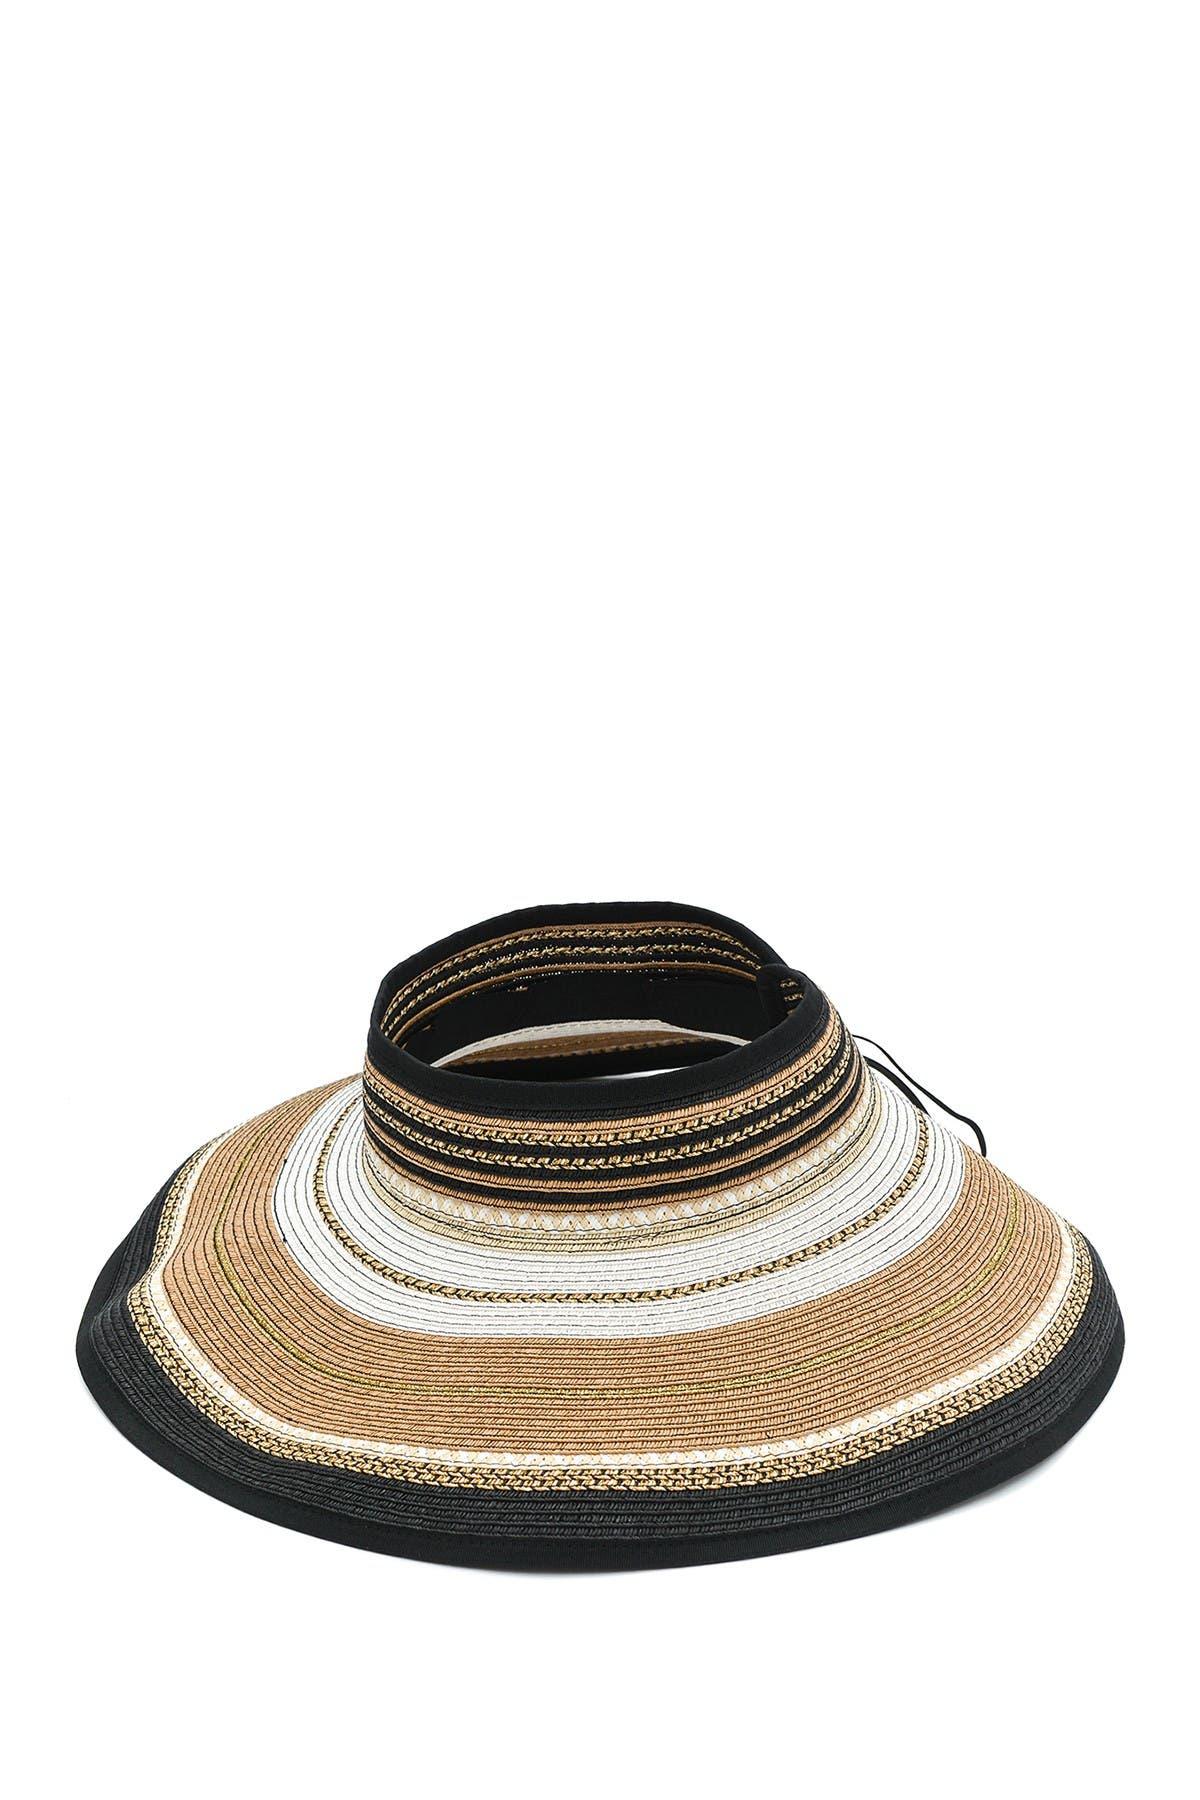 Image of Vince Camuto Multi-Stripe Lurex Roll-Up Visor